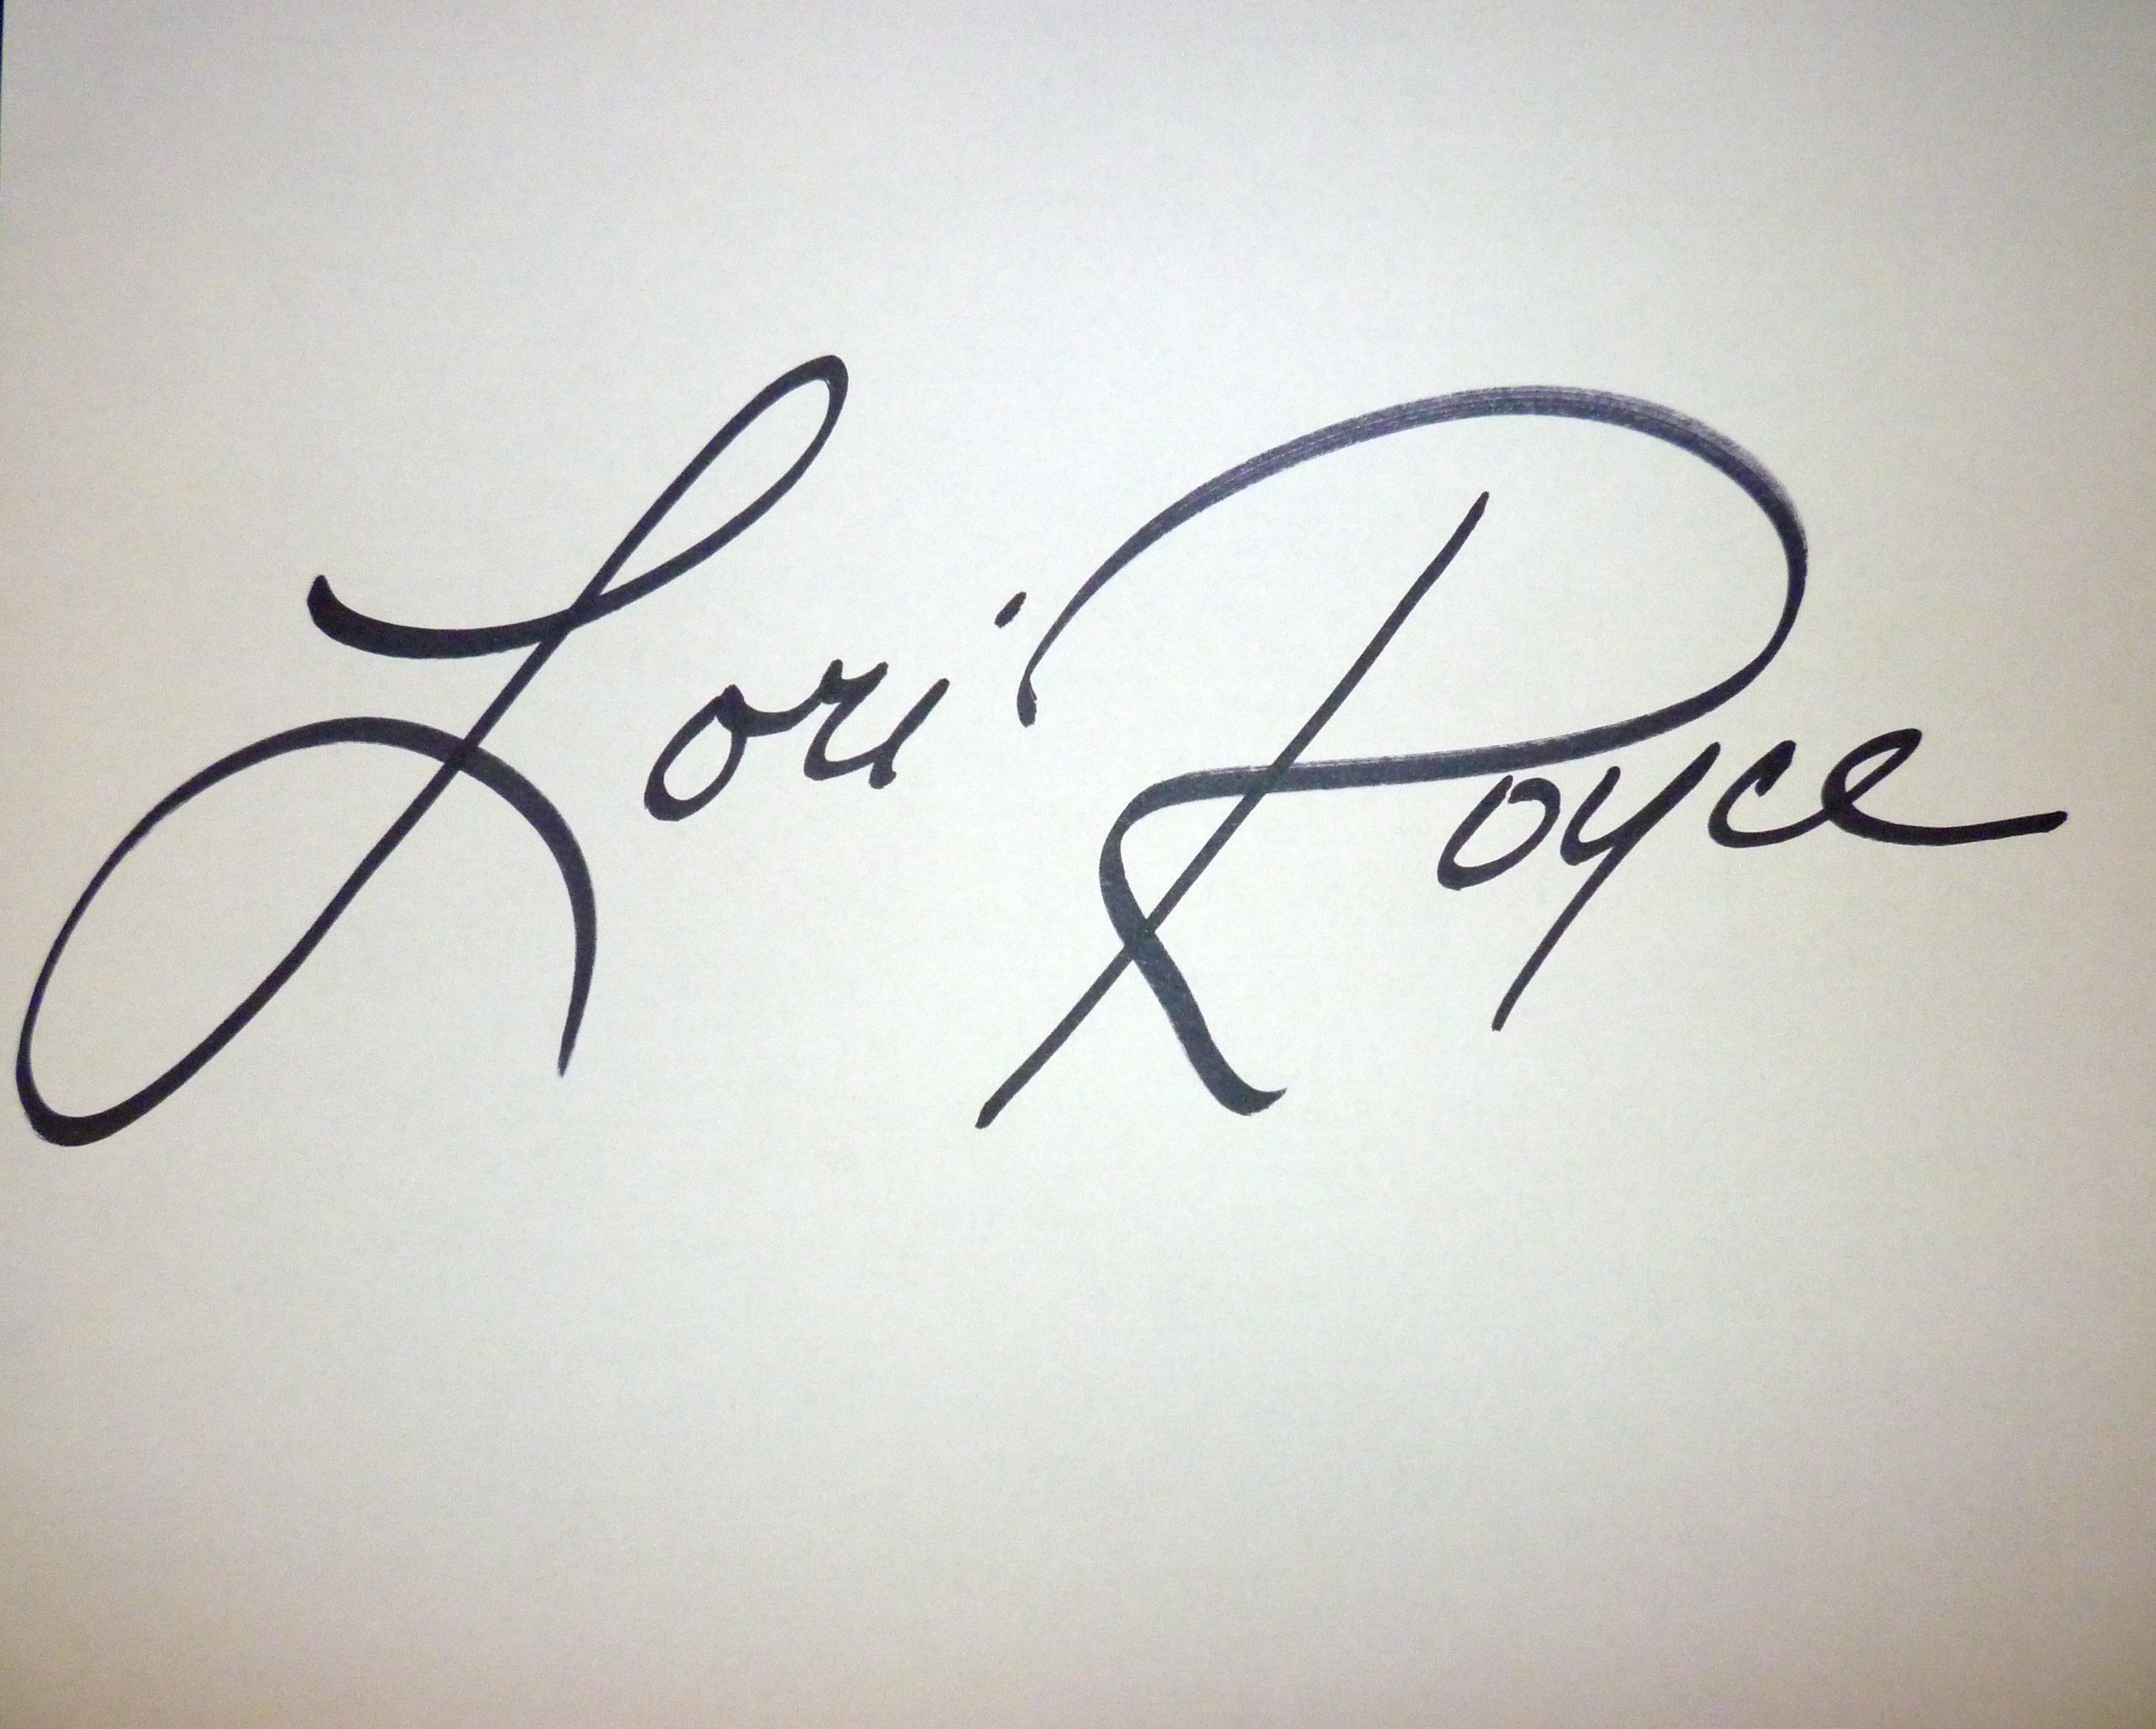 lori royce's Signature